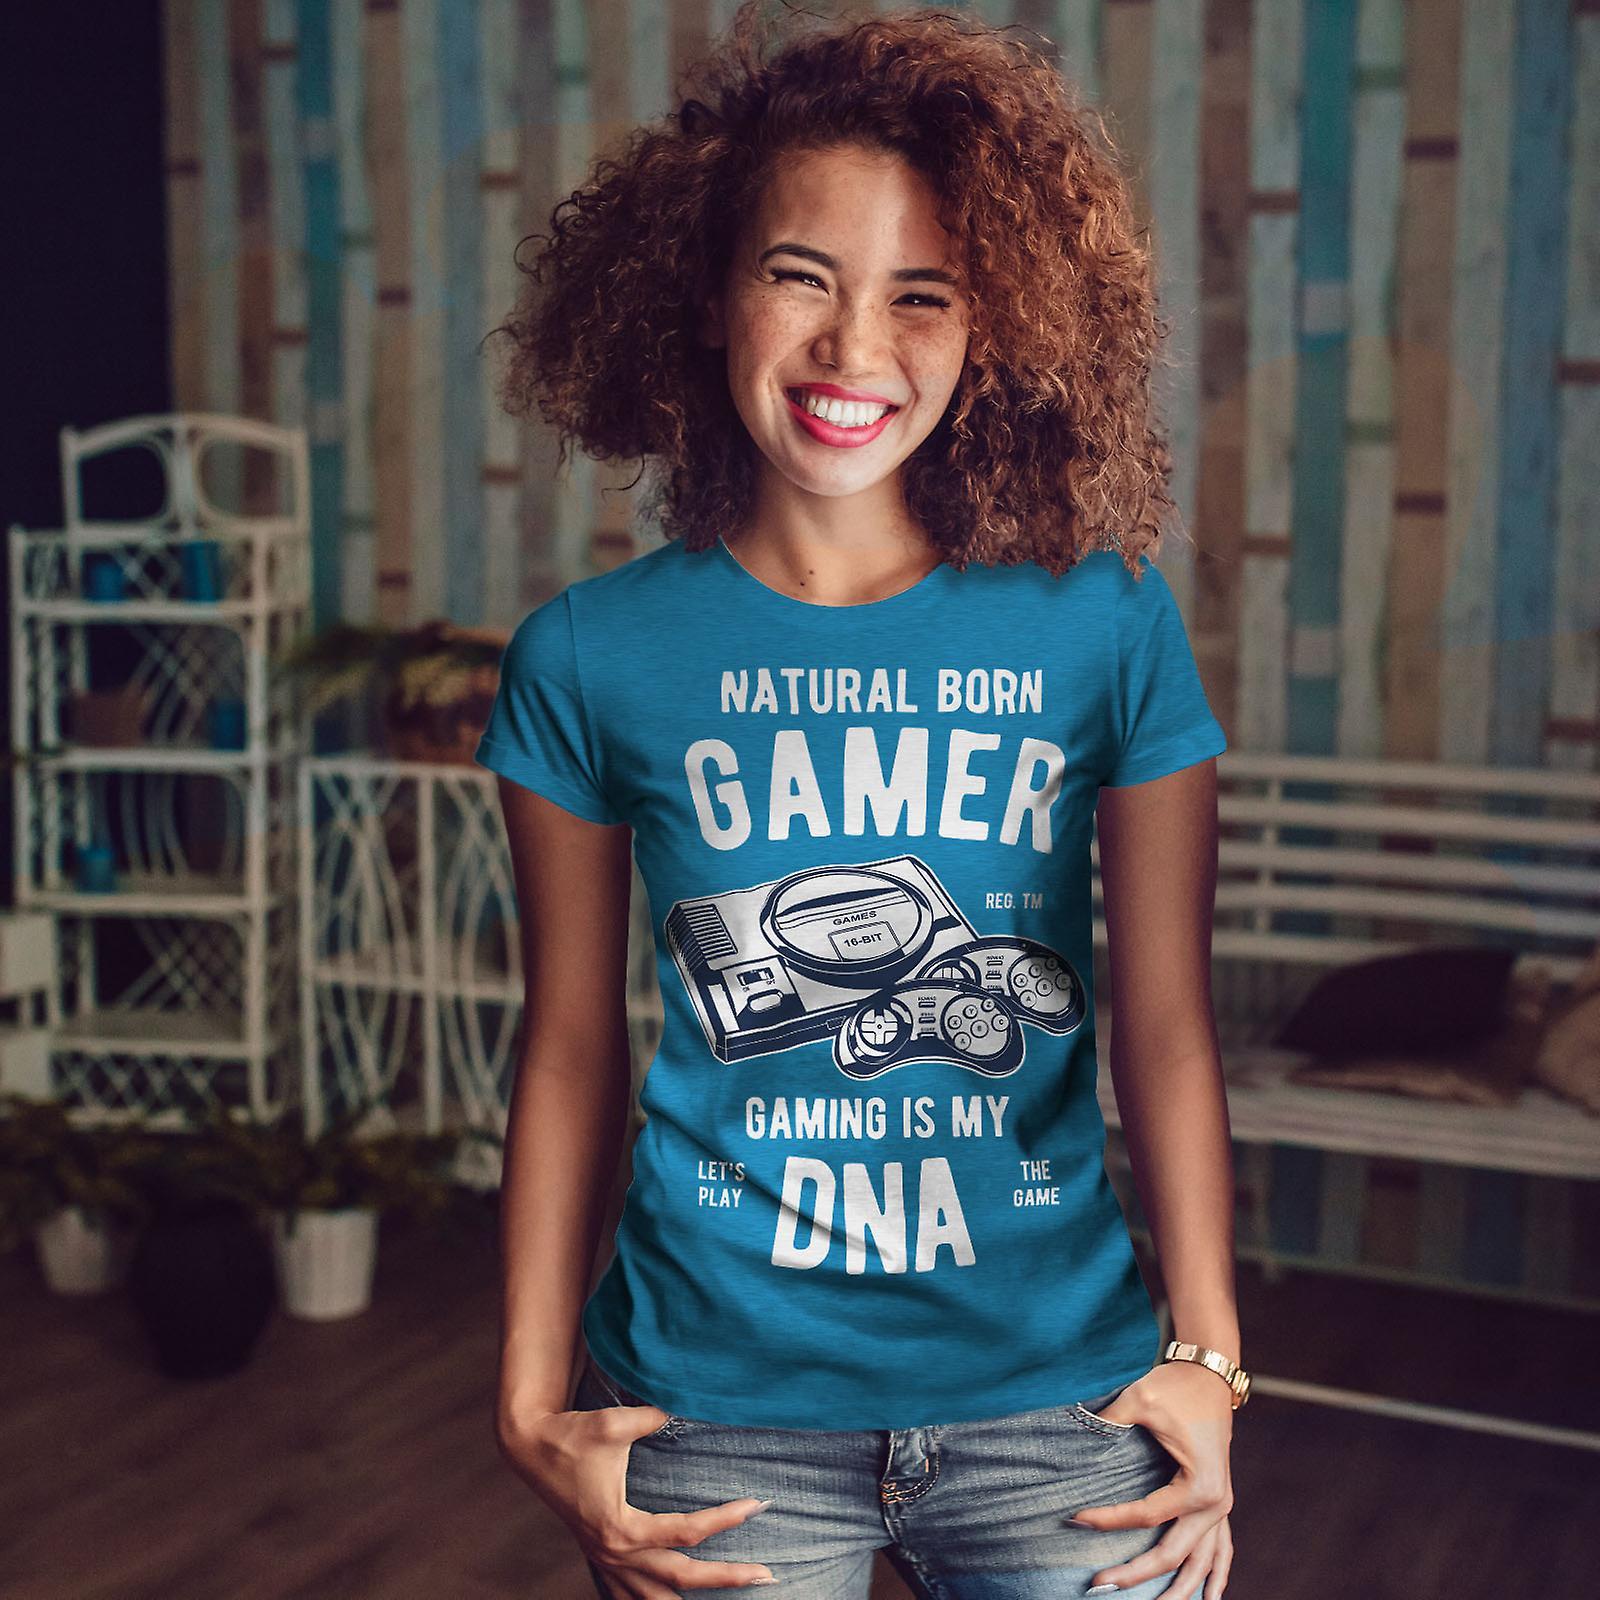 Natural Born Gamer Royal BlueT-chemise femme | Wellcoda